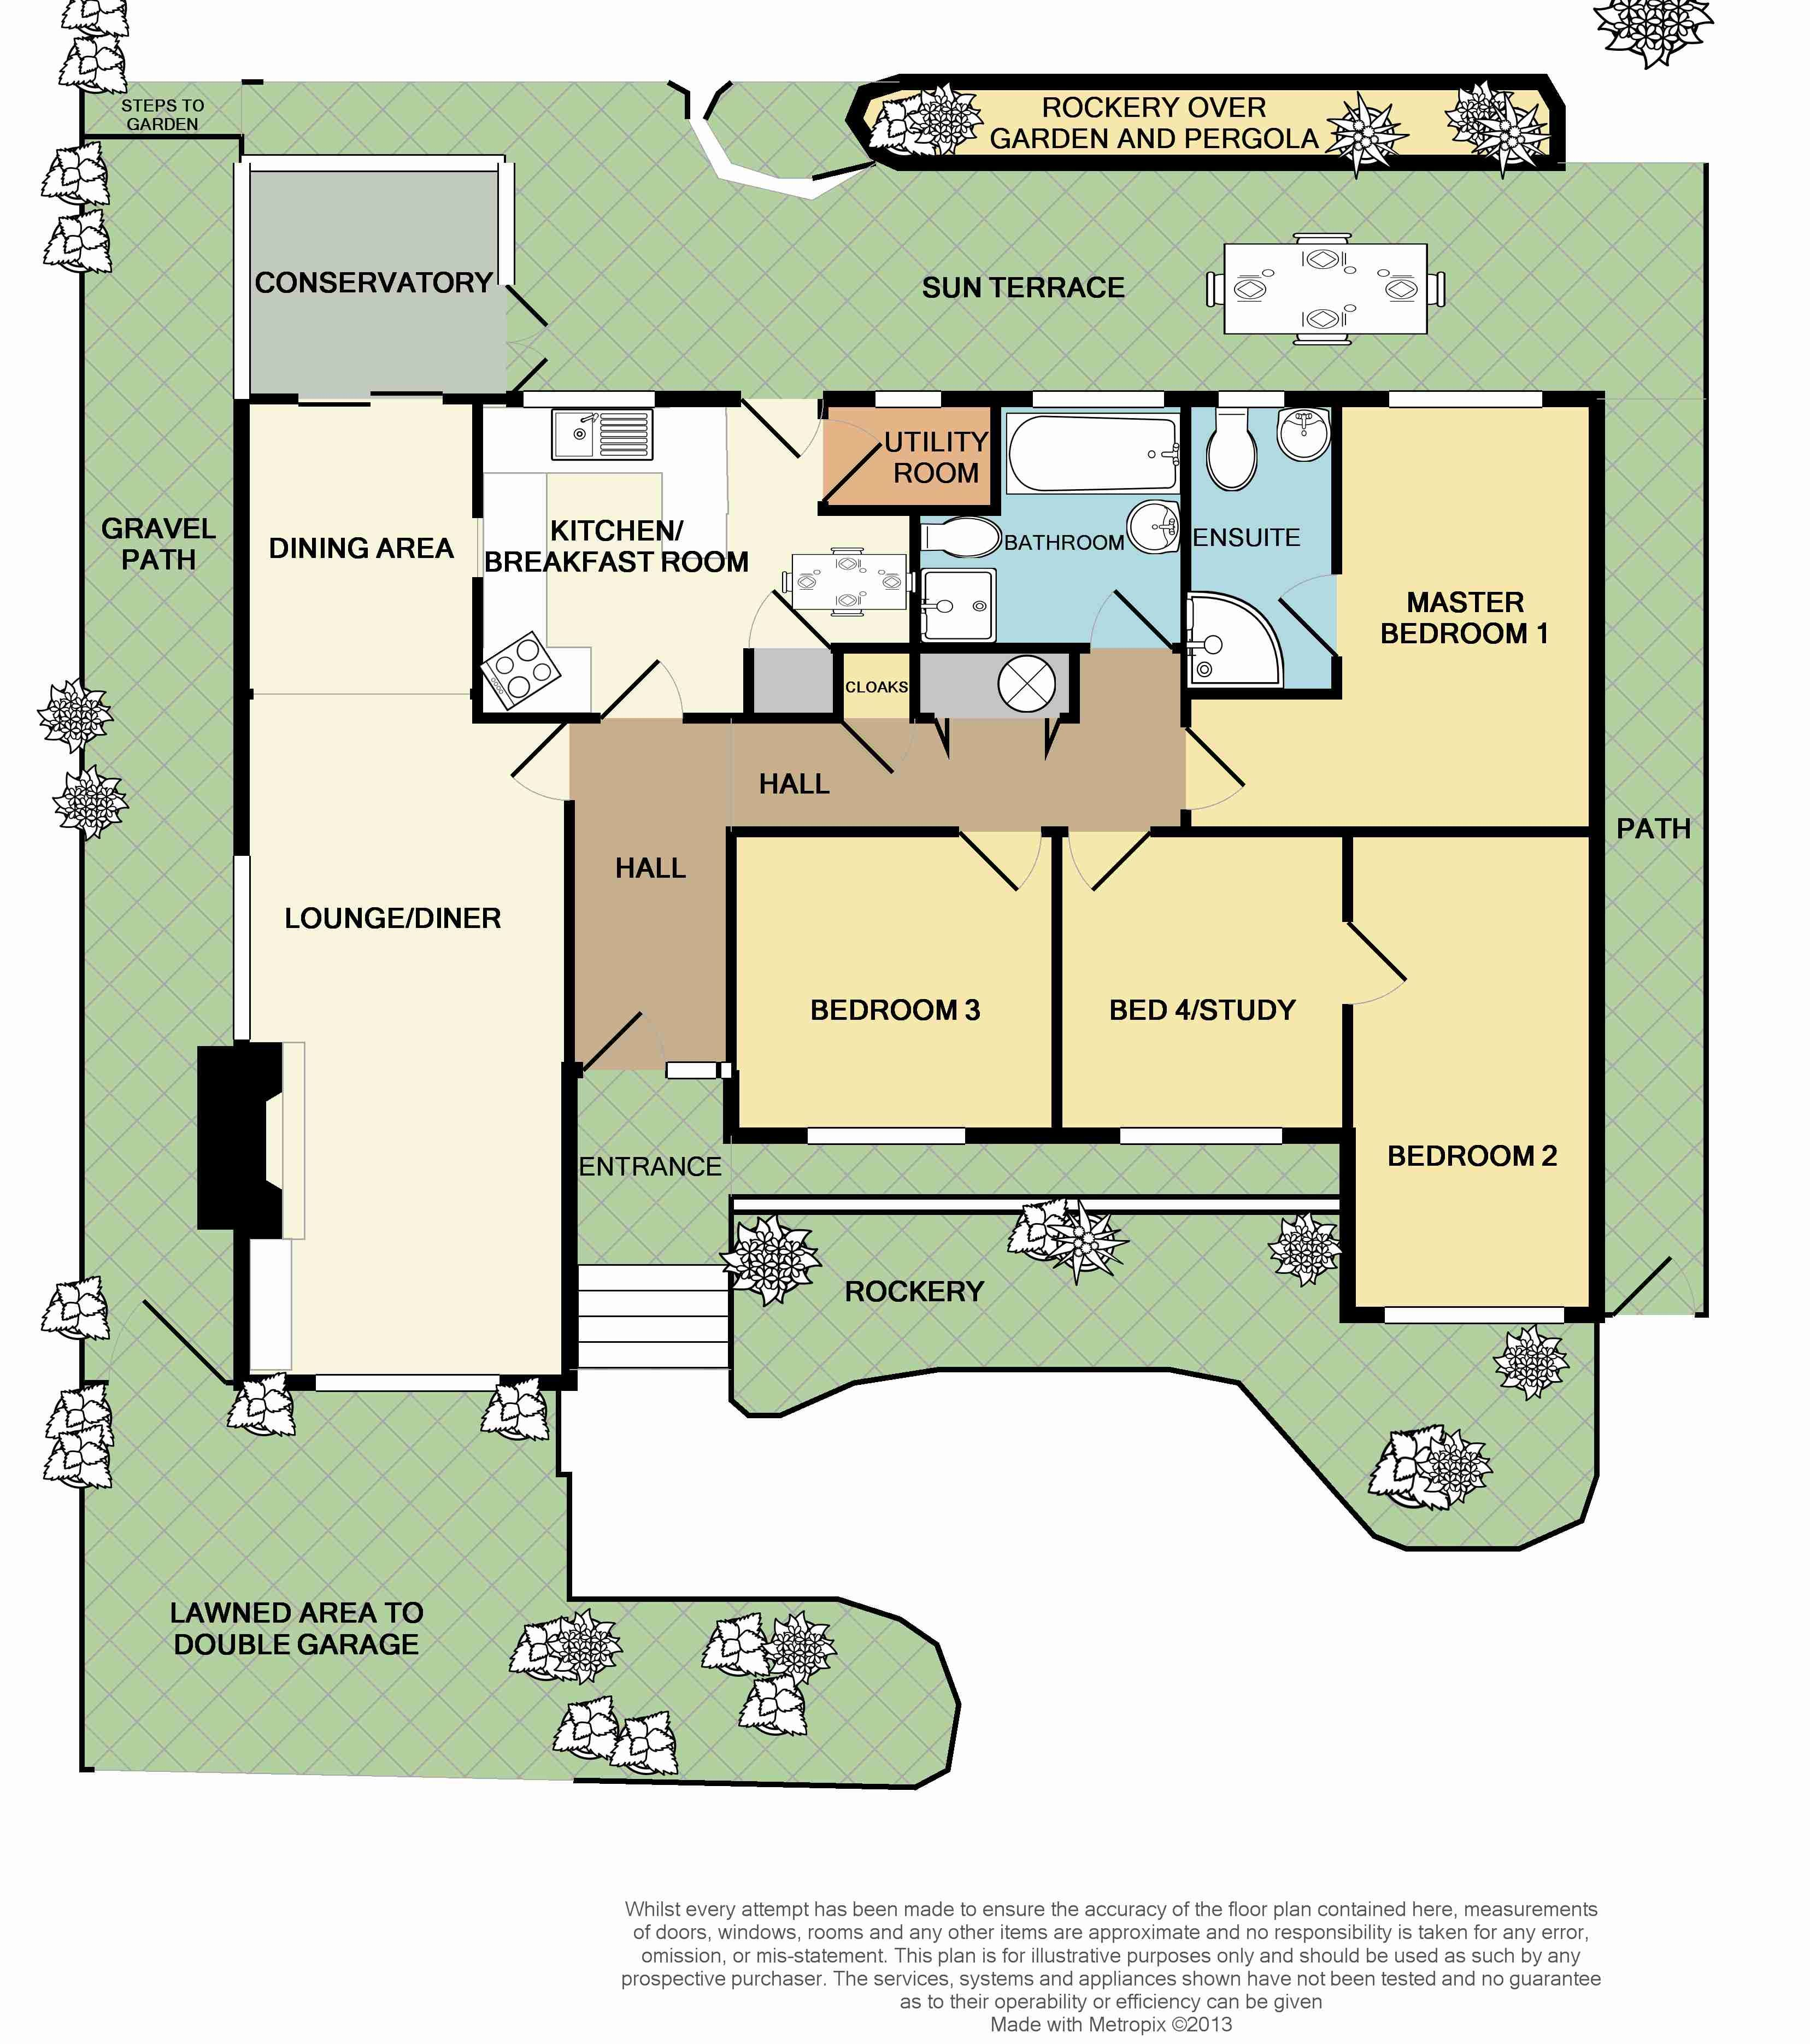 Virtual Bathroom Designer Free Captivating Free Floor Plan Software Kitchen Design Friv Games With Minimalist Design Inspiration